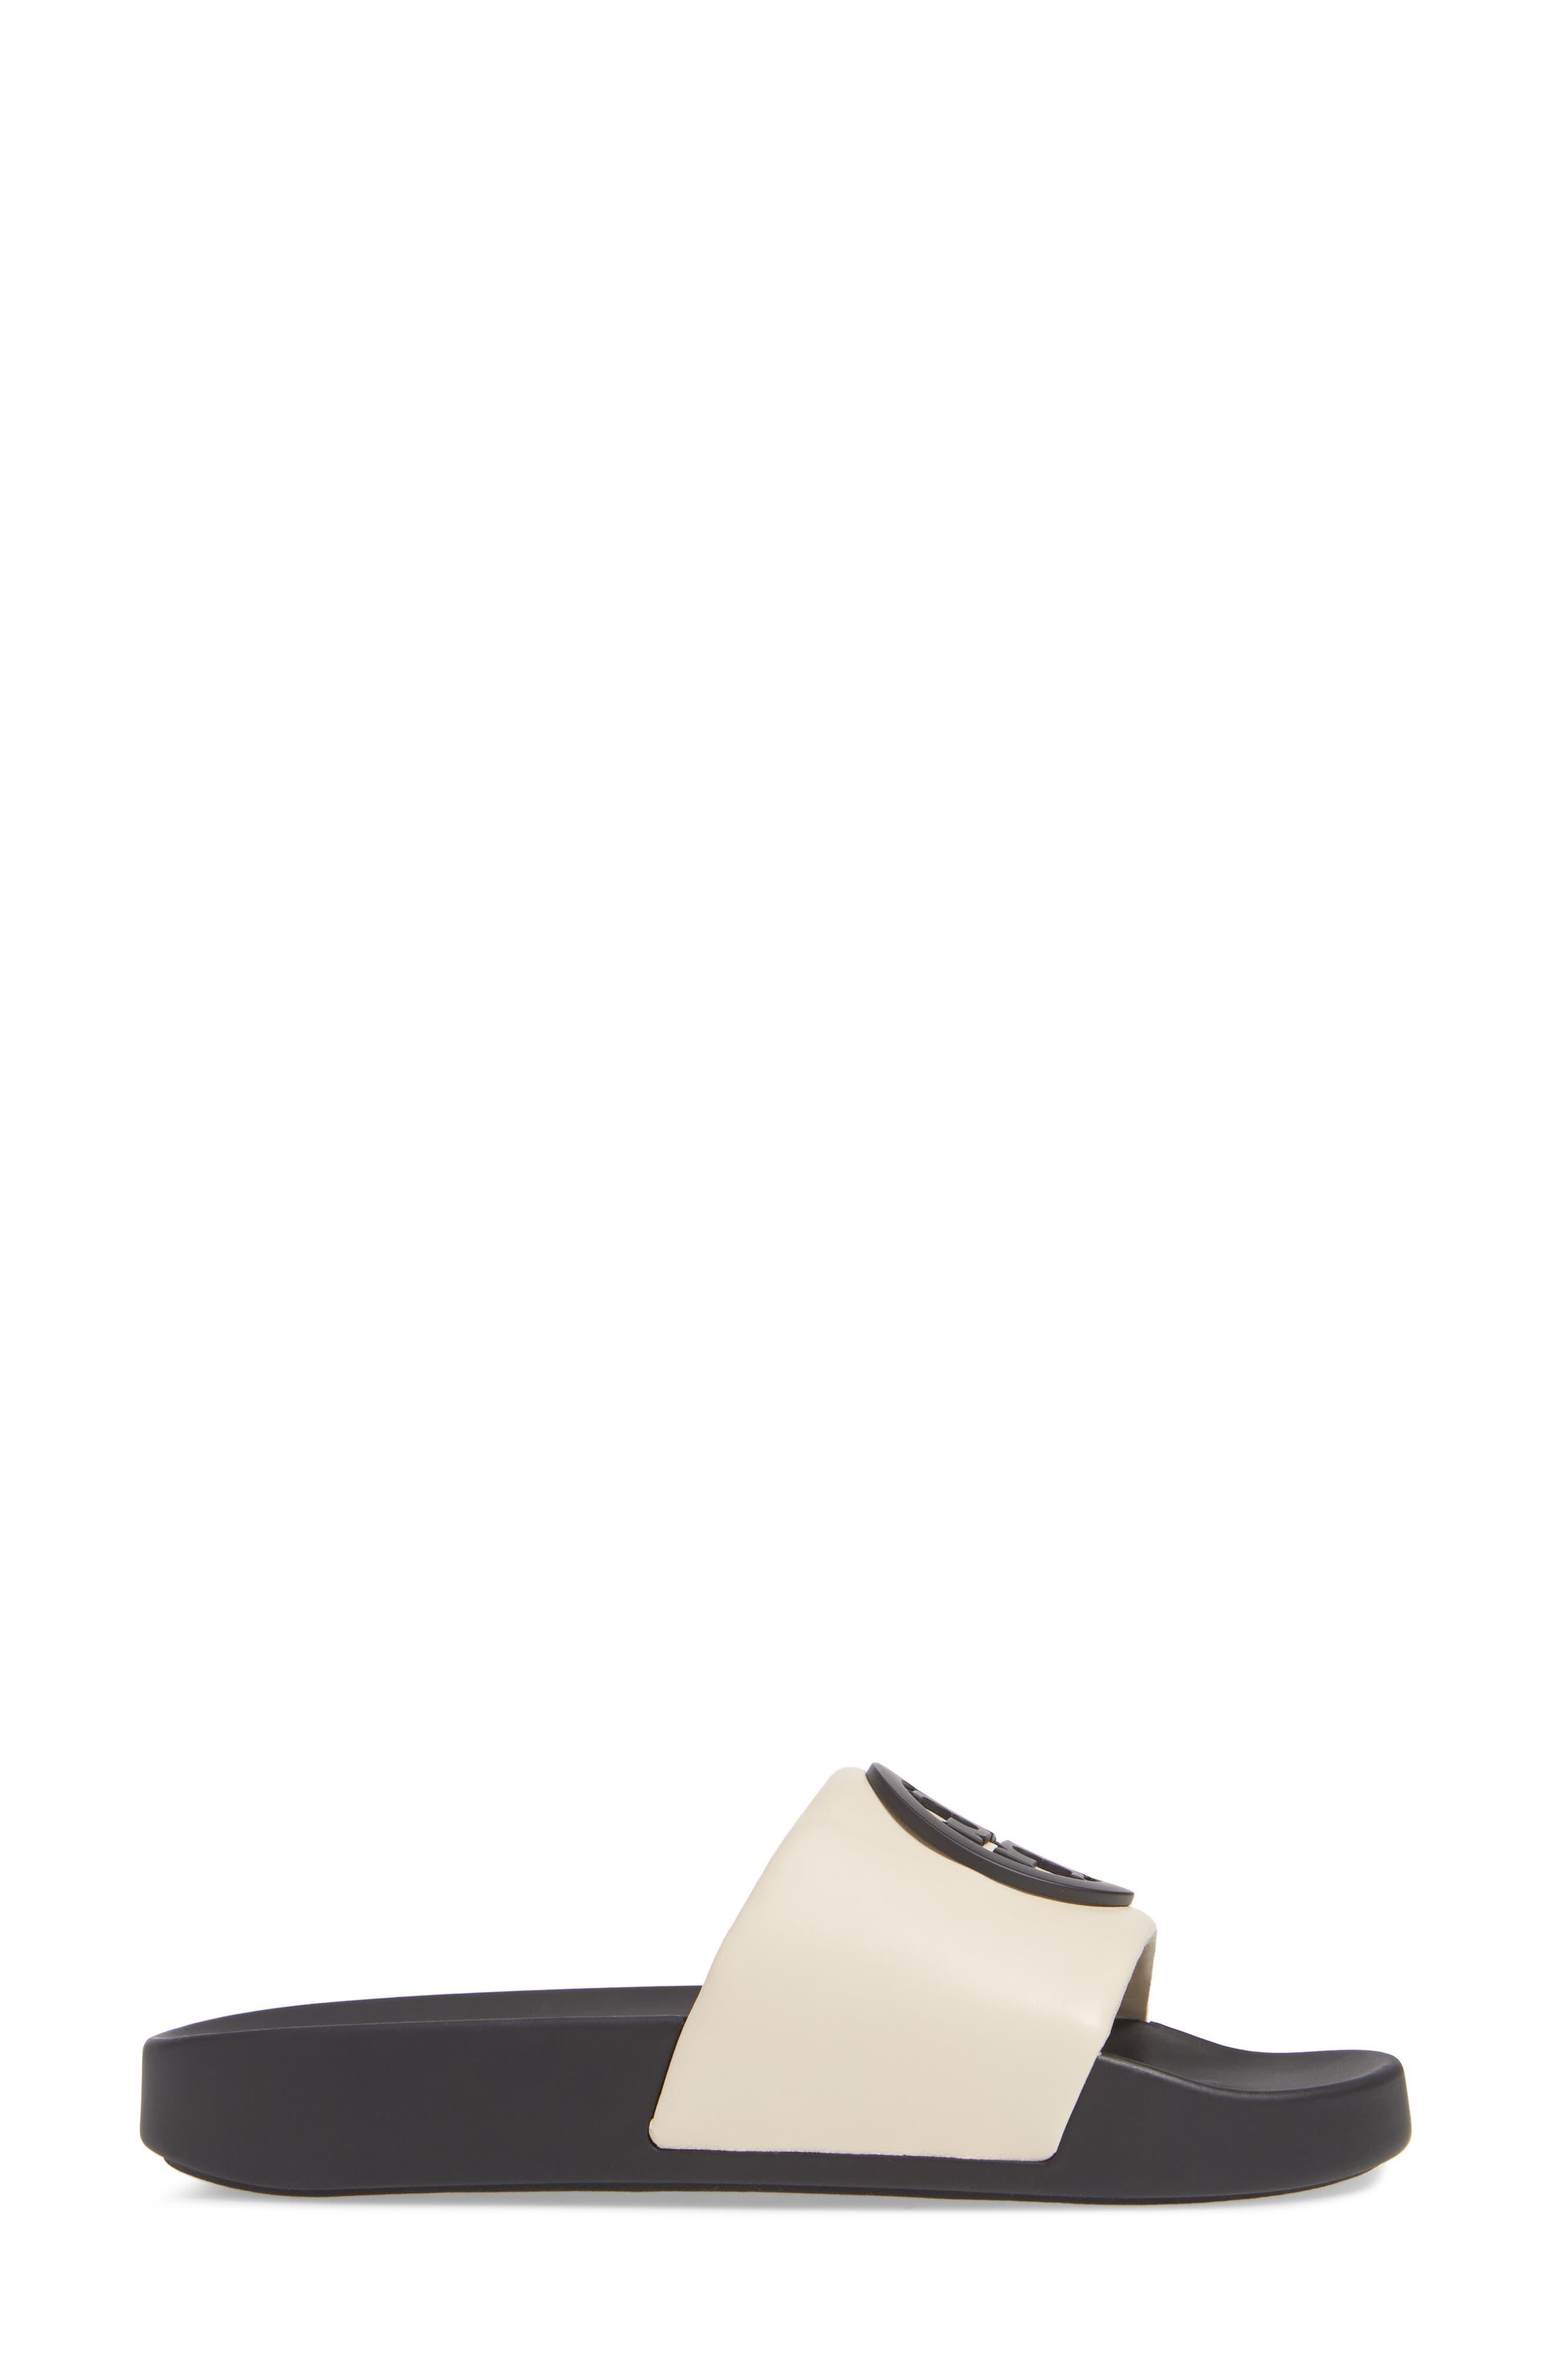 TORY BURCH, Lina Slide Sandal, Alternate thumbnail 3, color, NEW CREAM/ PERFECT BLACK